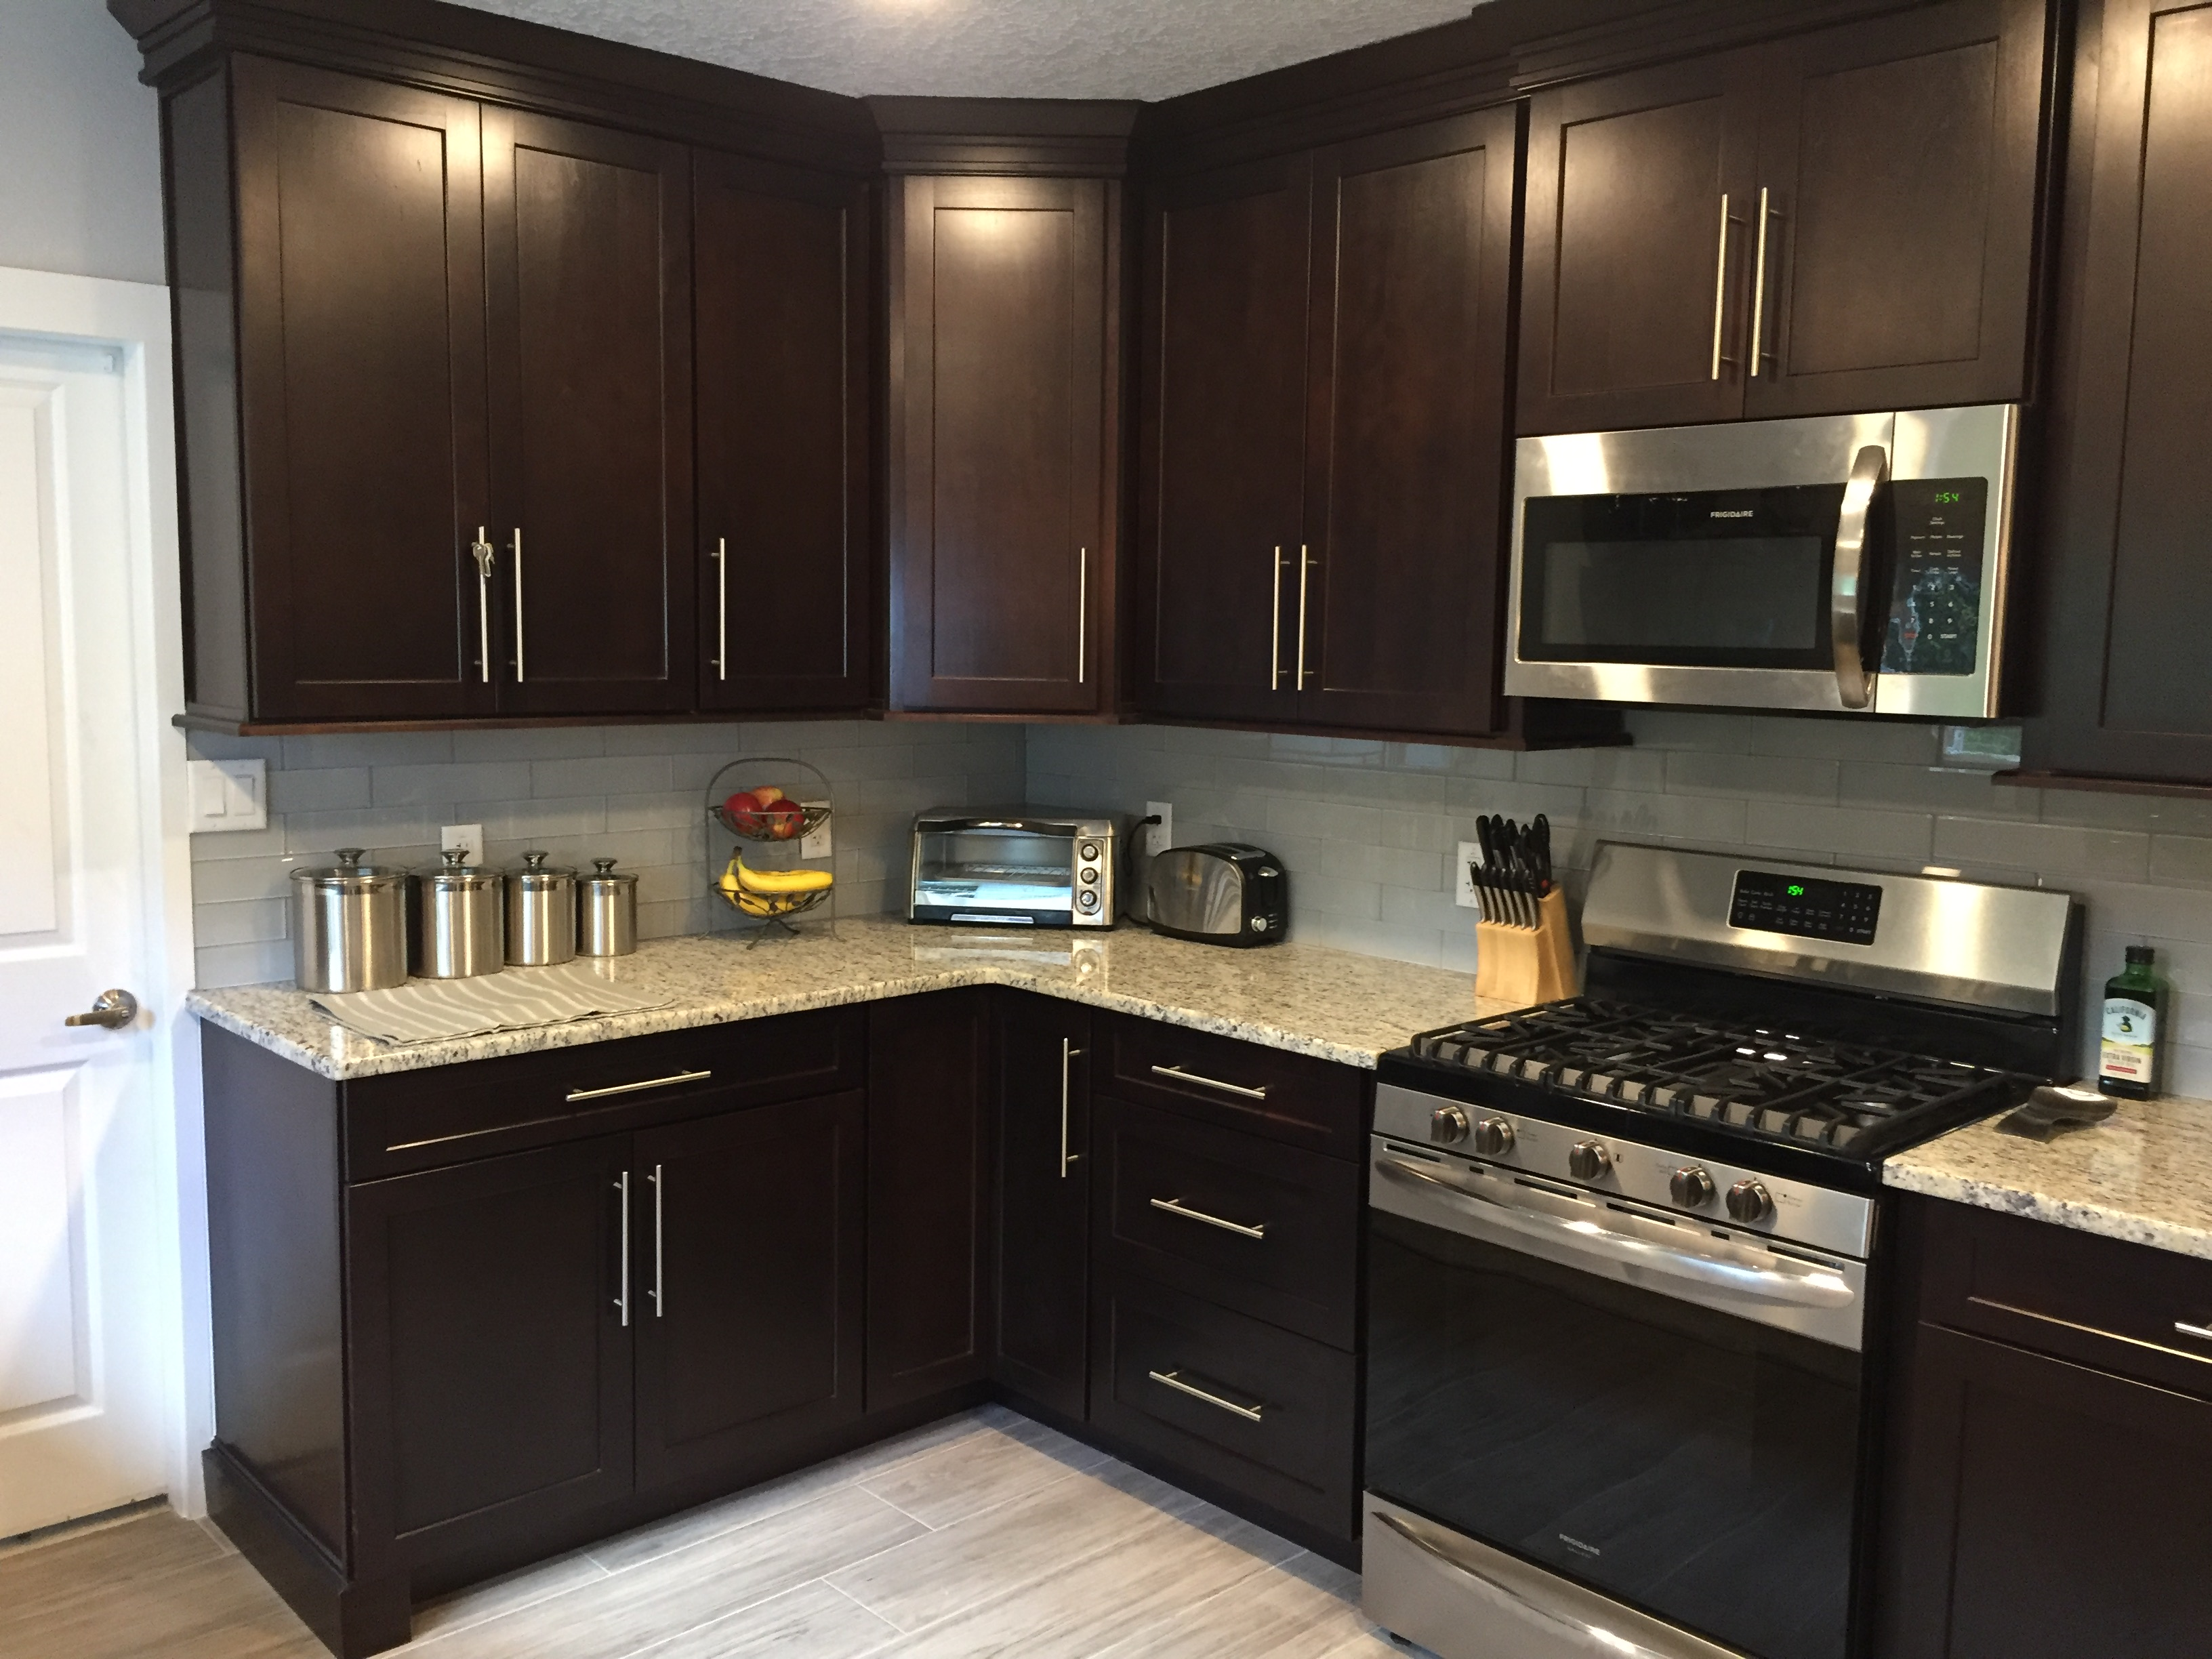 cherry java shaker door 650 series from waypoint cabinets kitchen remodel kitchen cabinets on kitchen cabinets java id=32038